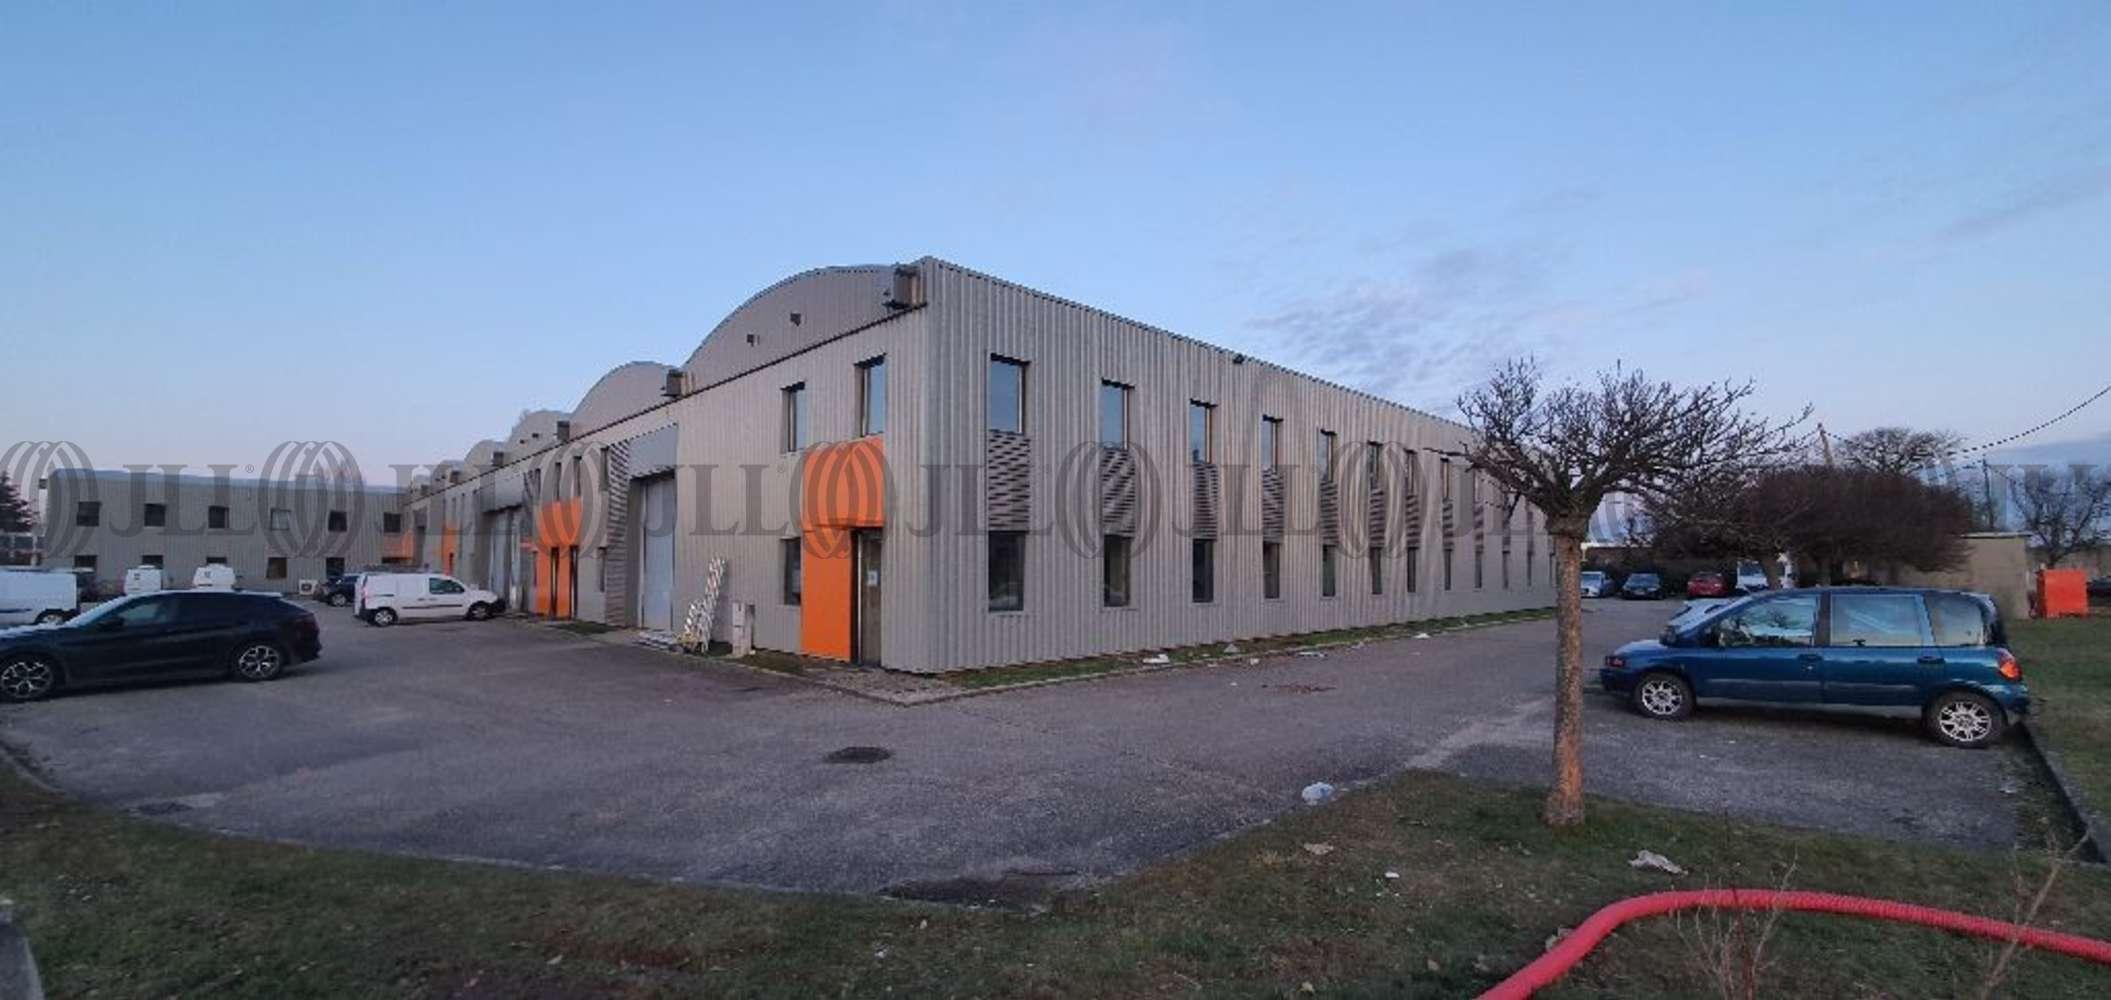 Activités/entrepôt Dardilly, 69570 - Location locaux d'activité Dardilly Lyon - 10921712